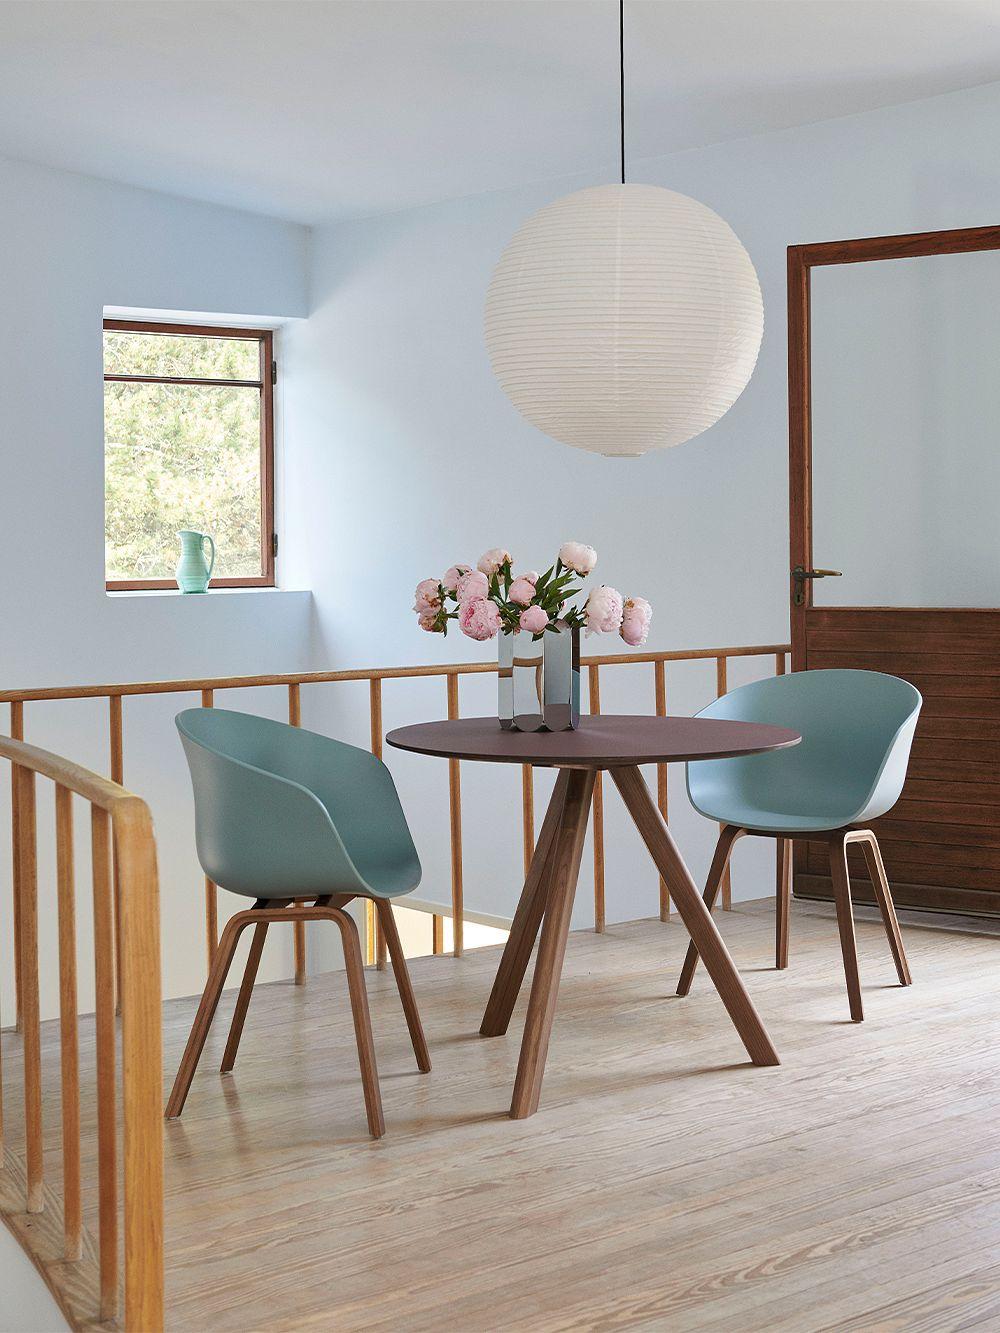 HAY AAC22 chair in walnut